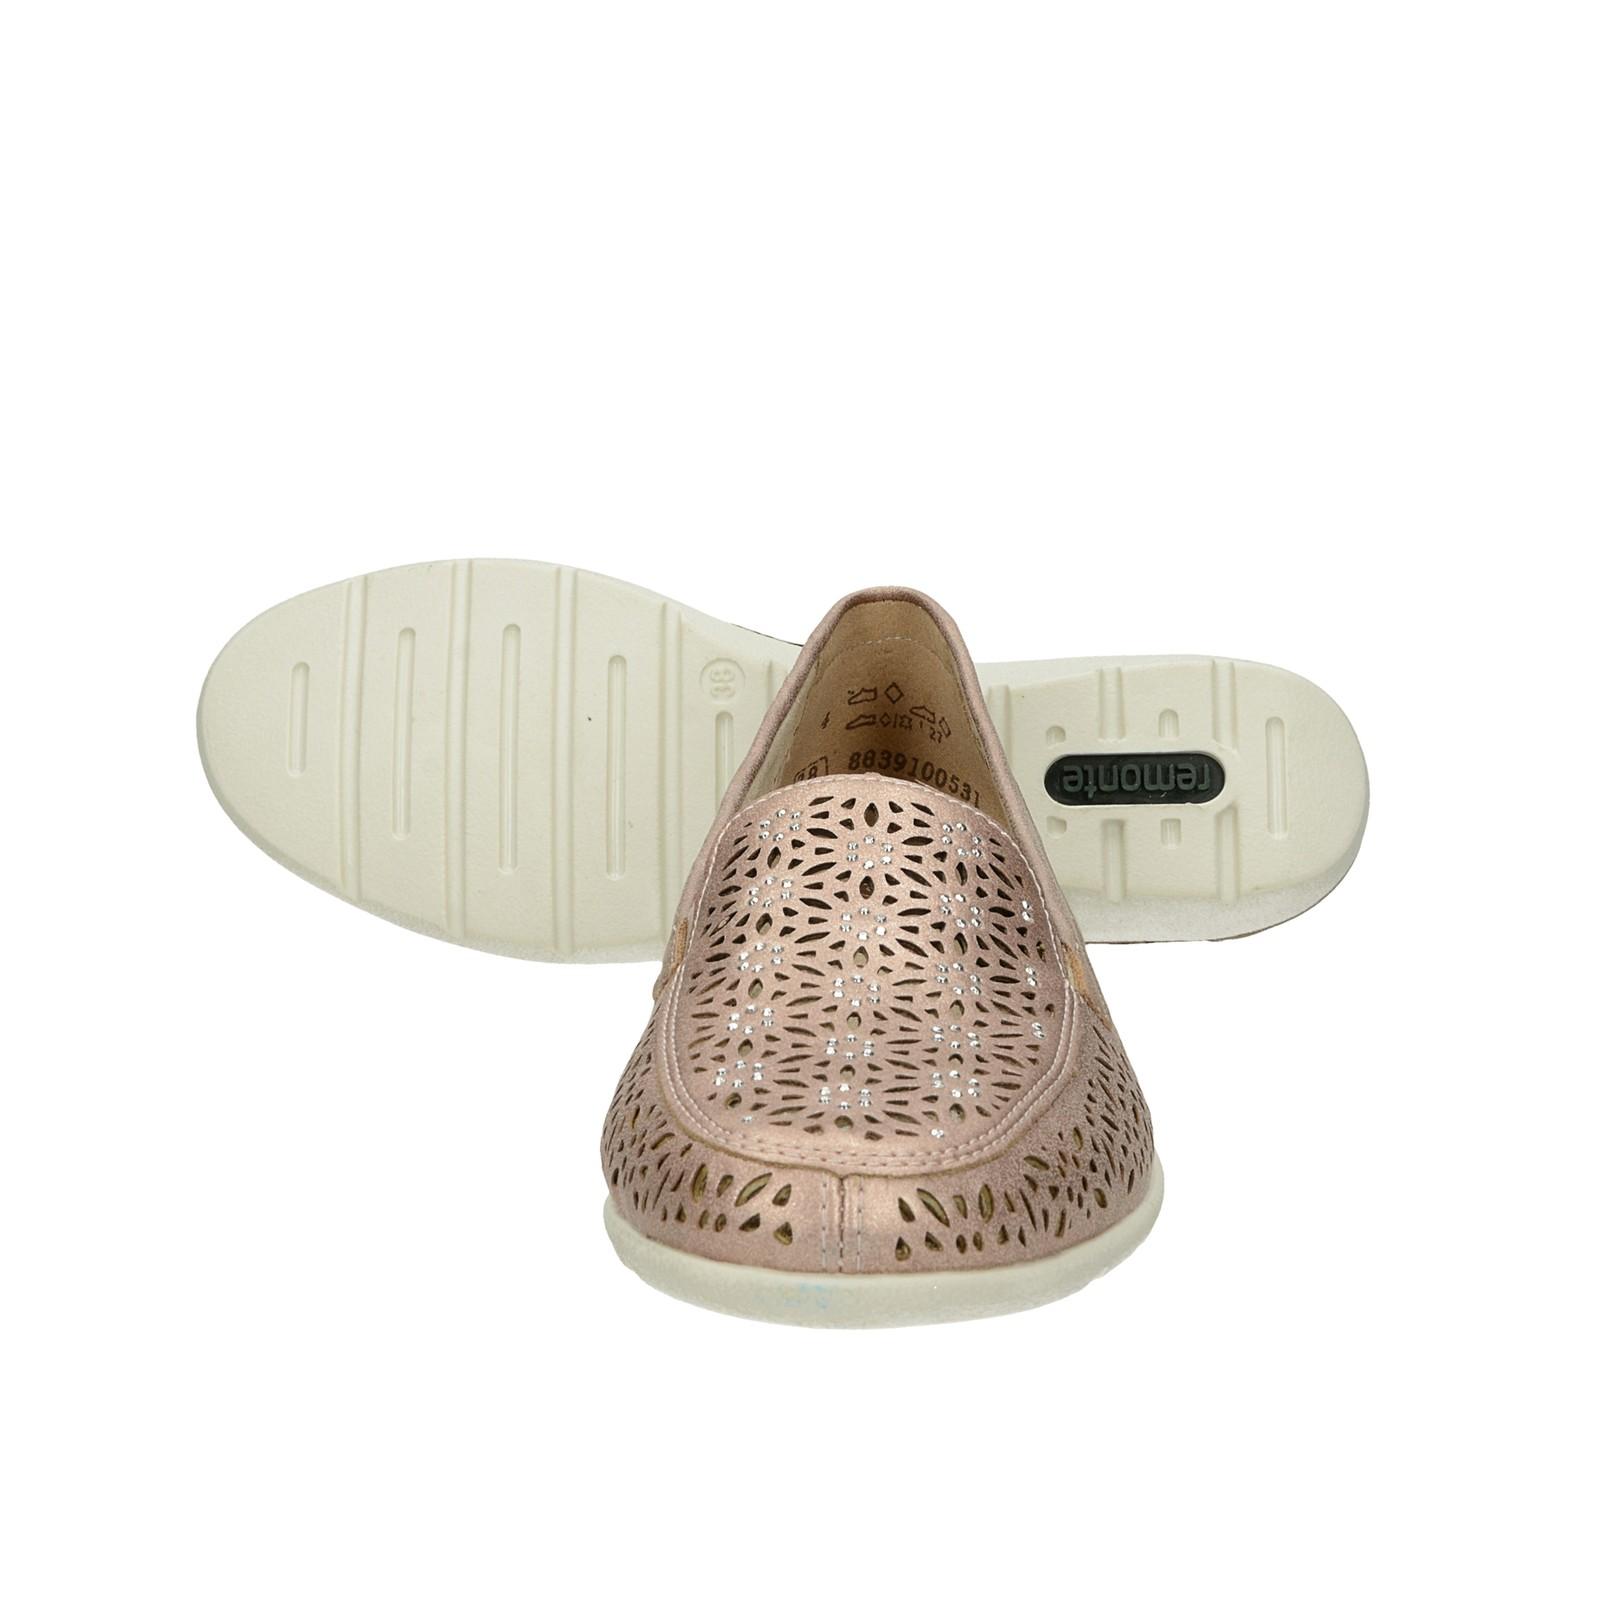 Remonte dámské stylové perforované tenisky - růžové